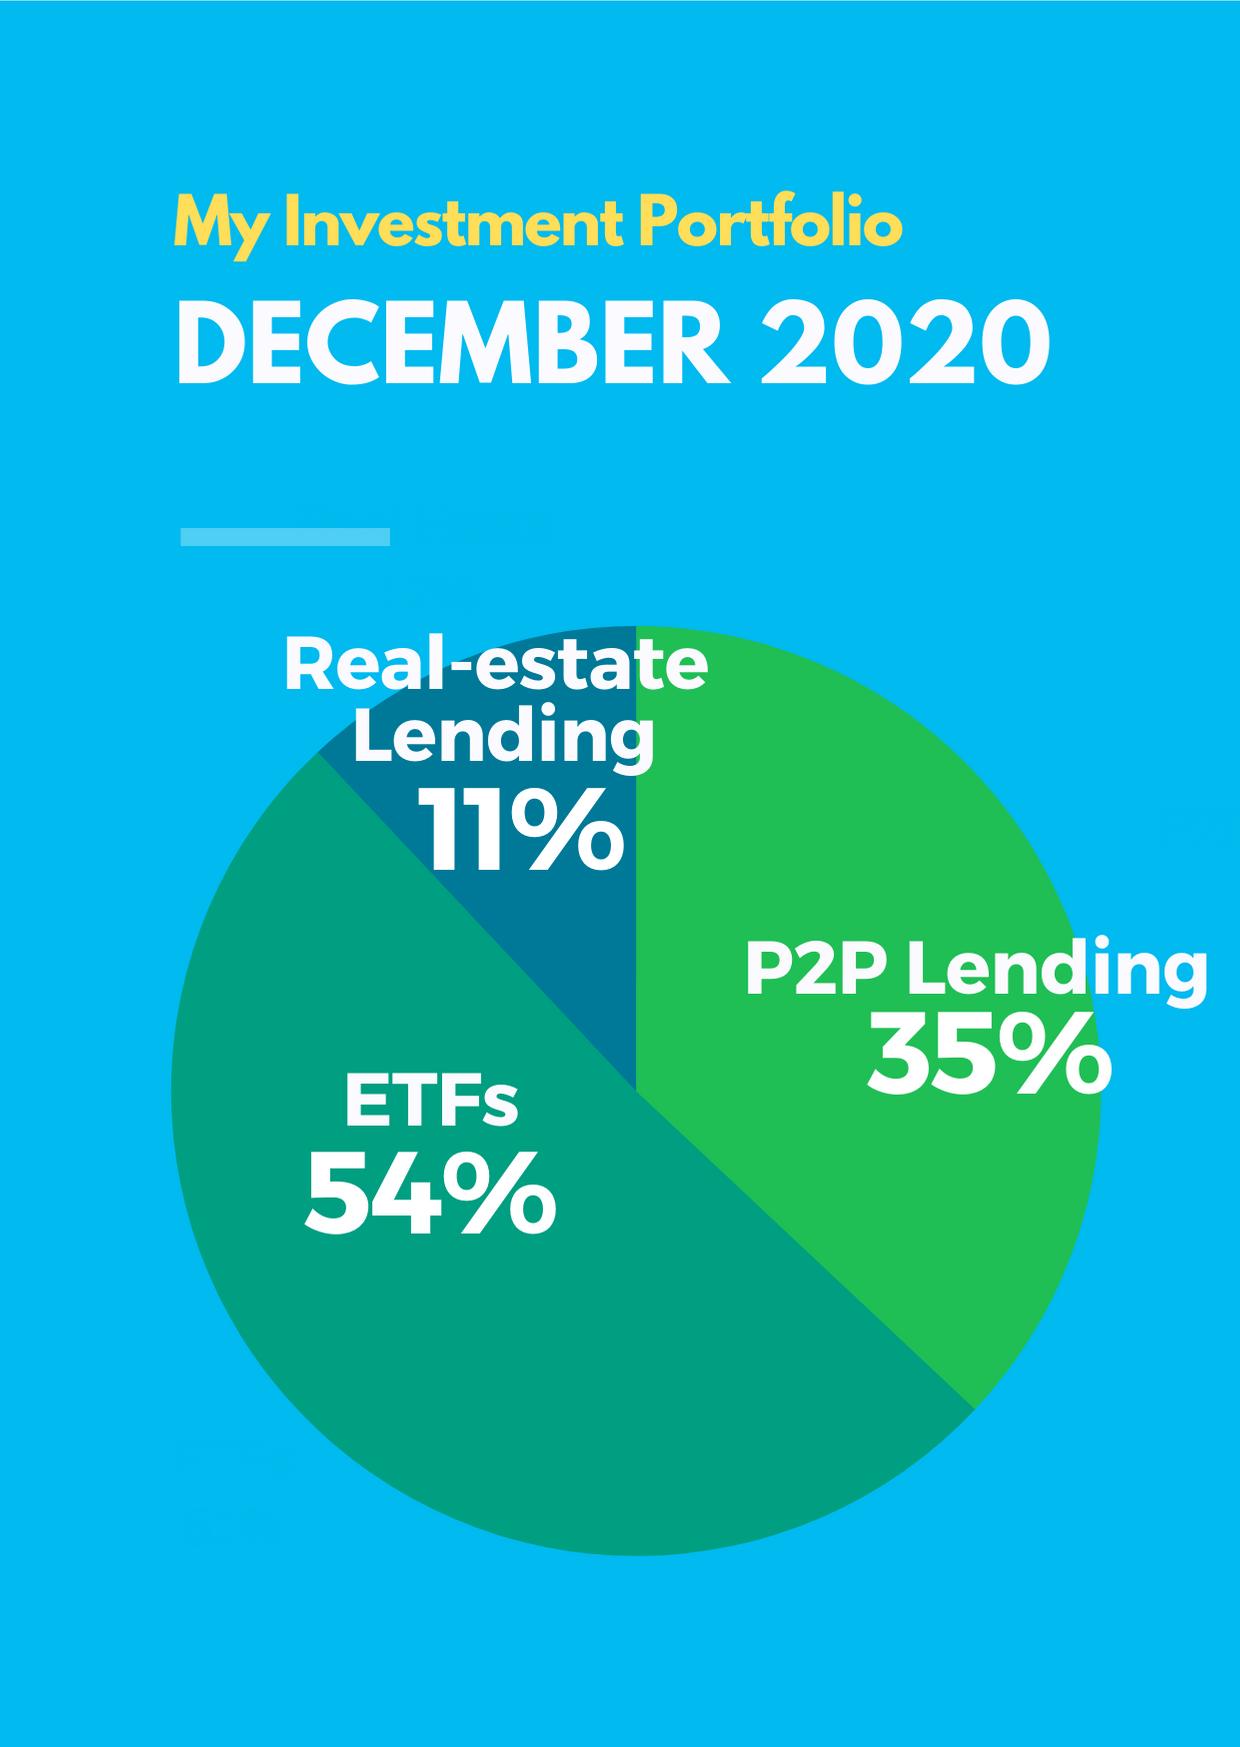 December 2020 Passive Income Investment Portfolio